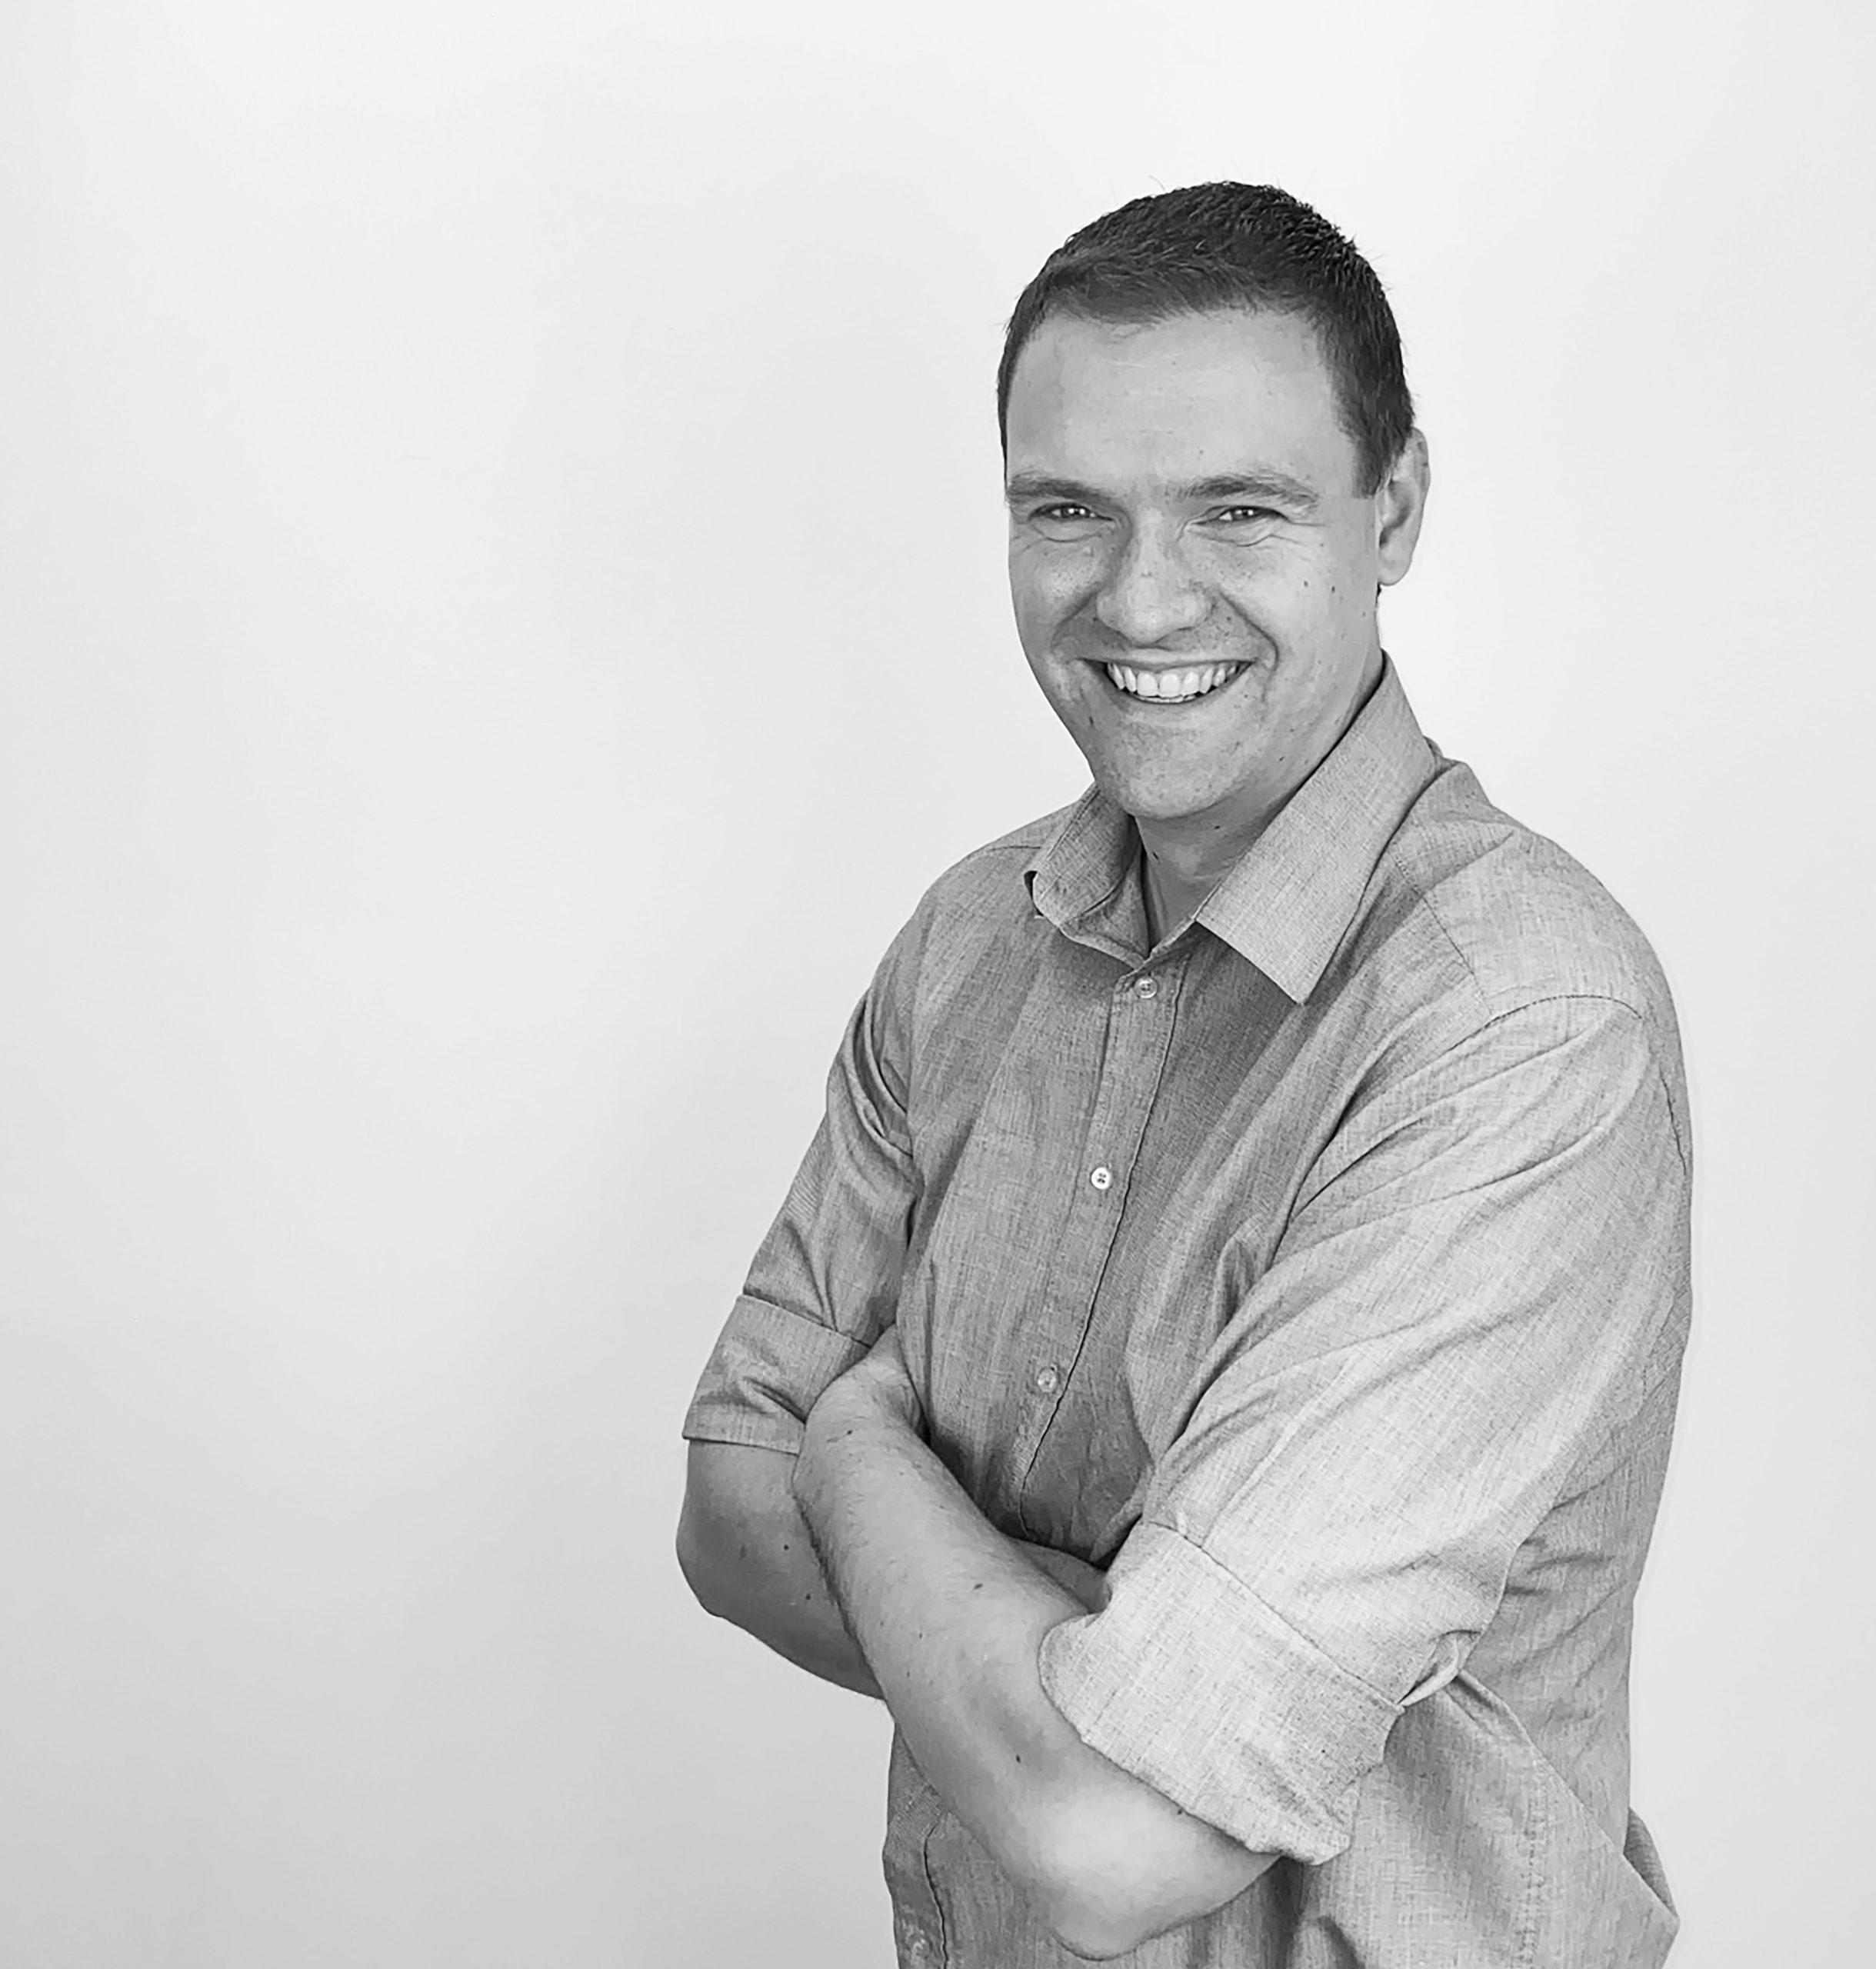 Image of Gareth Merser